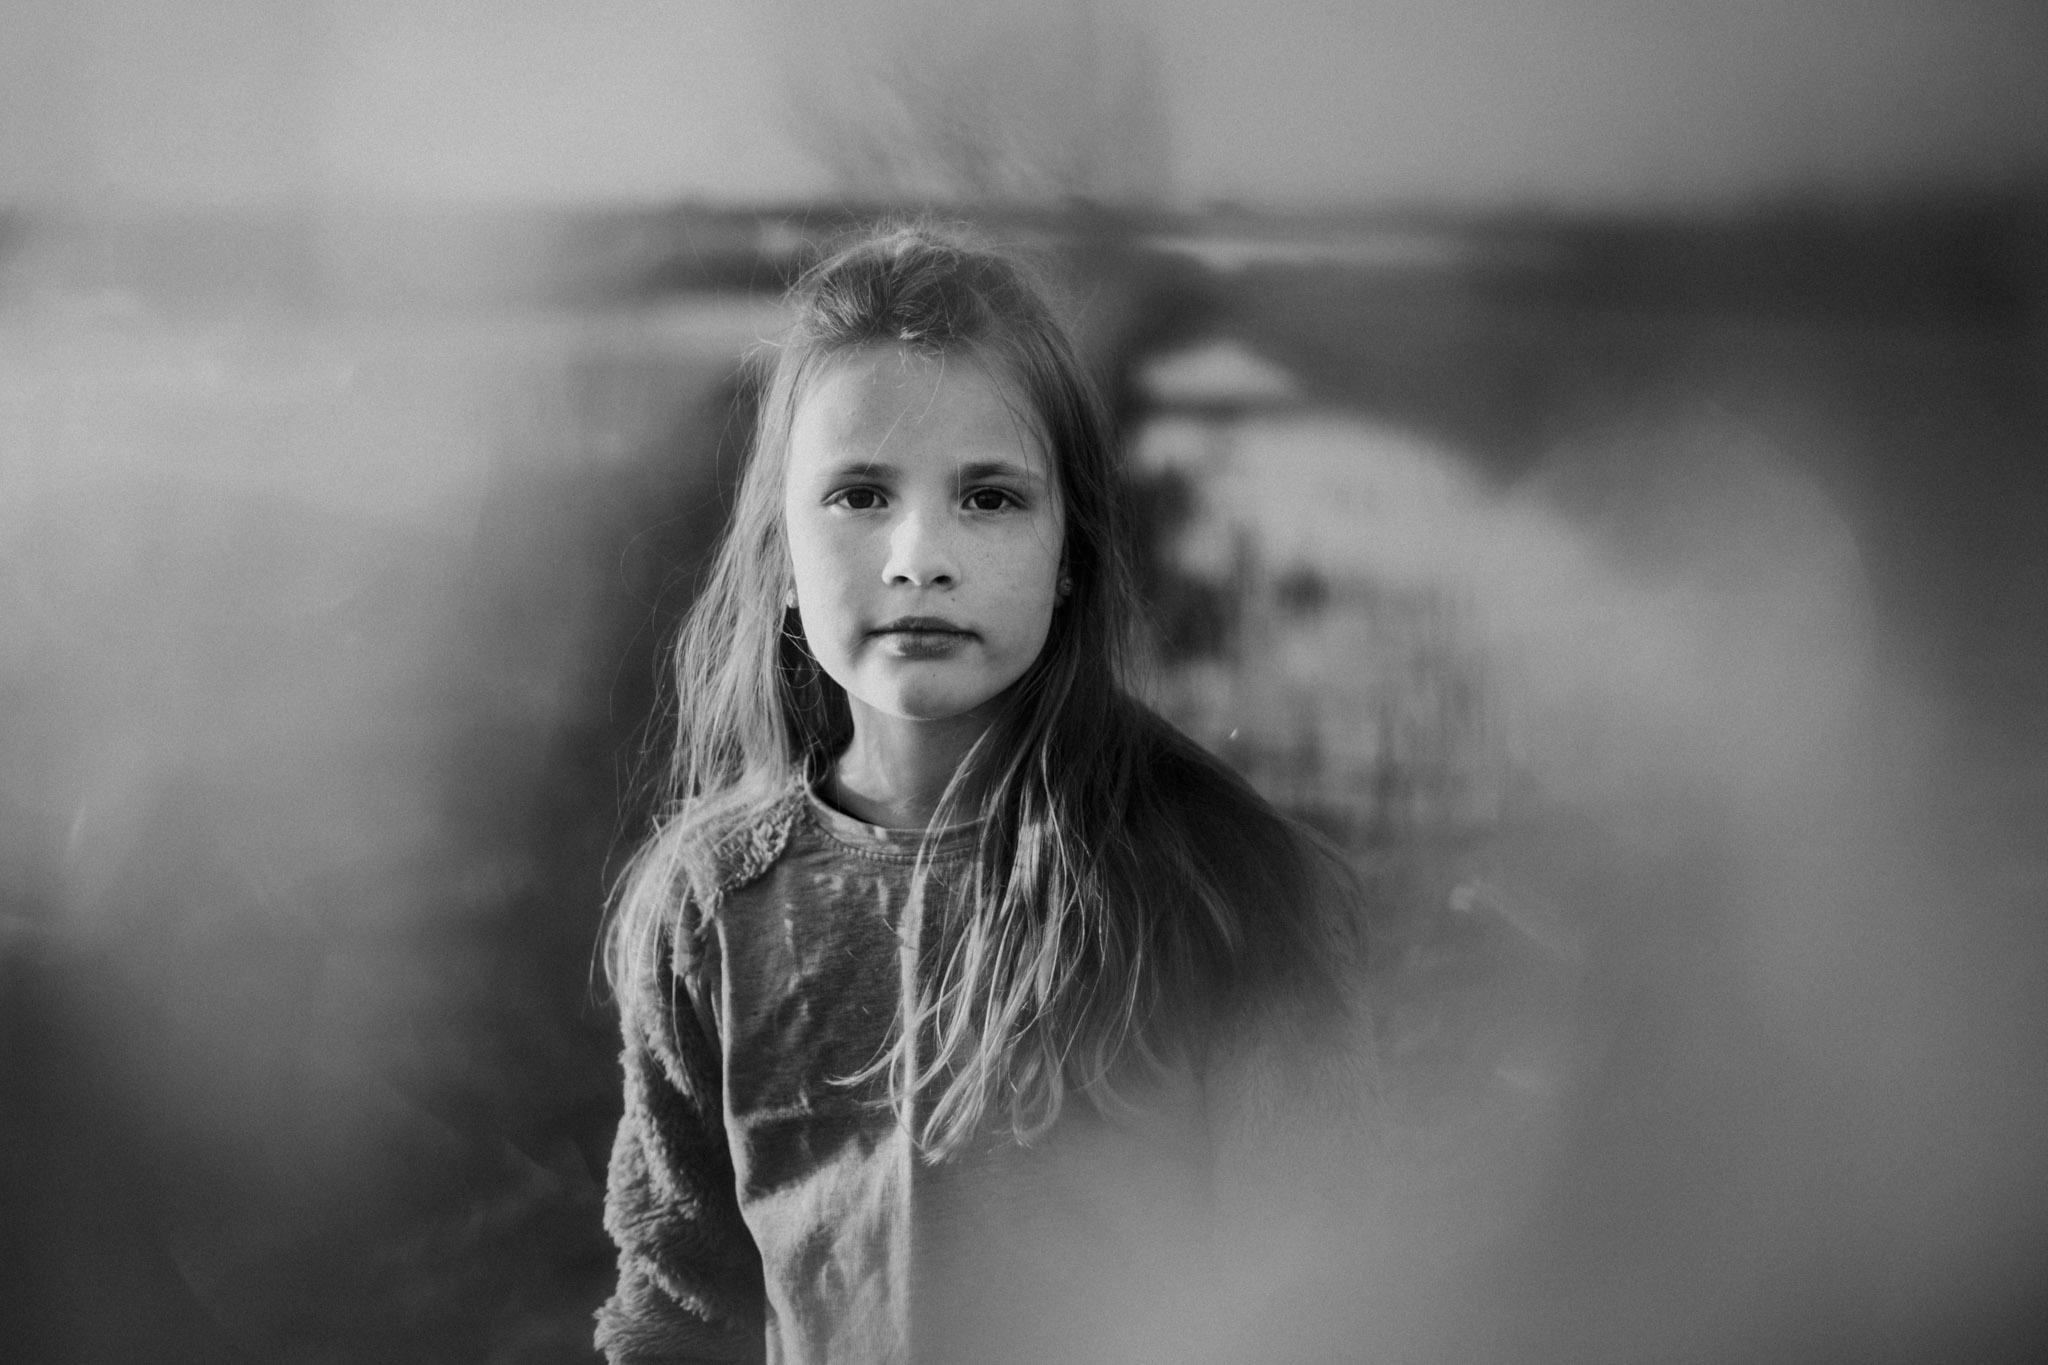 stoere kinderportretten buiten